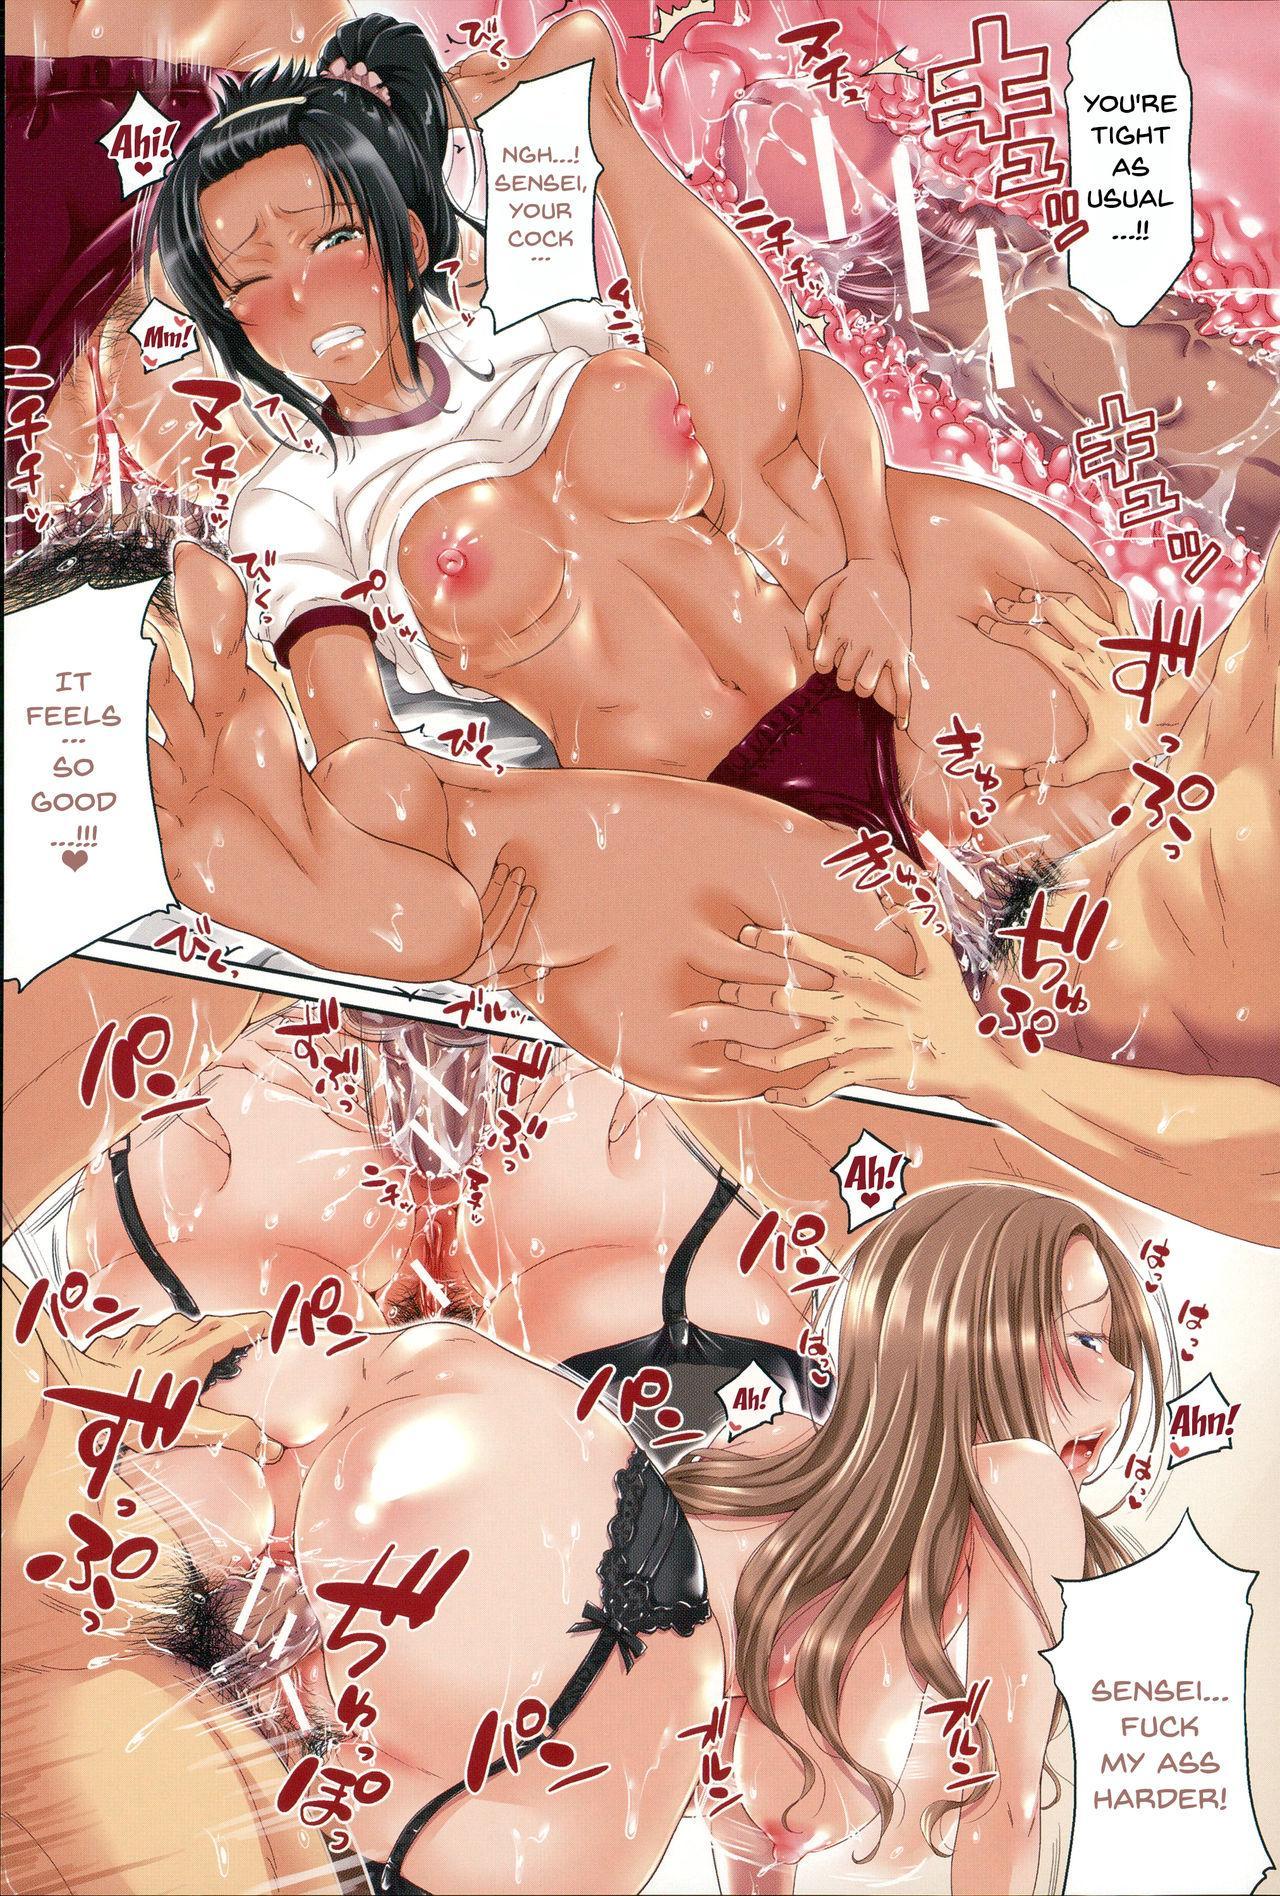 Pakotate! Seikouritsu 0% no Teppeki Bishojo VS Seikouritsu 100% no Hentai Katei Kyoushi   Pakotate! Sex Rate 0% Iron-Willed Beautiful Virgins VS Sex Rate 100% Perverted Coach 4